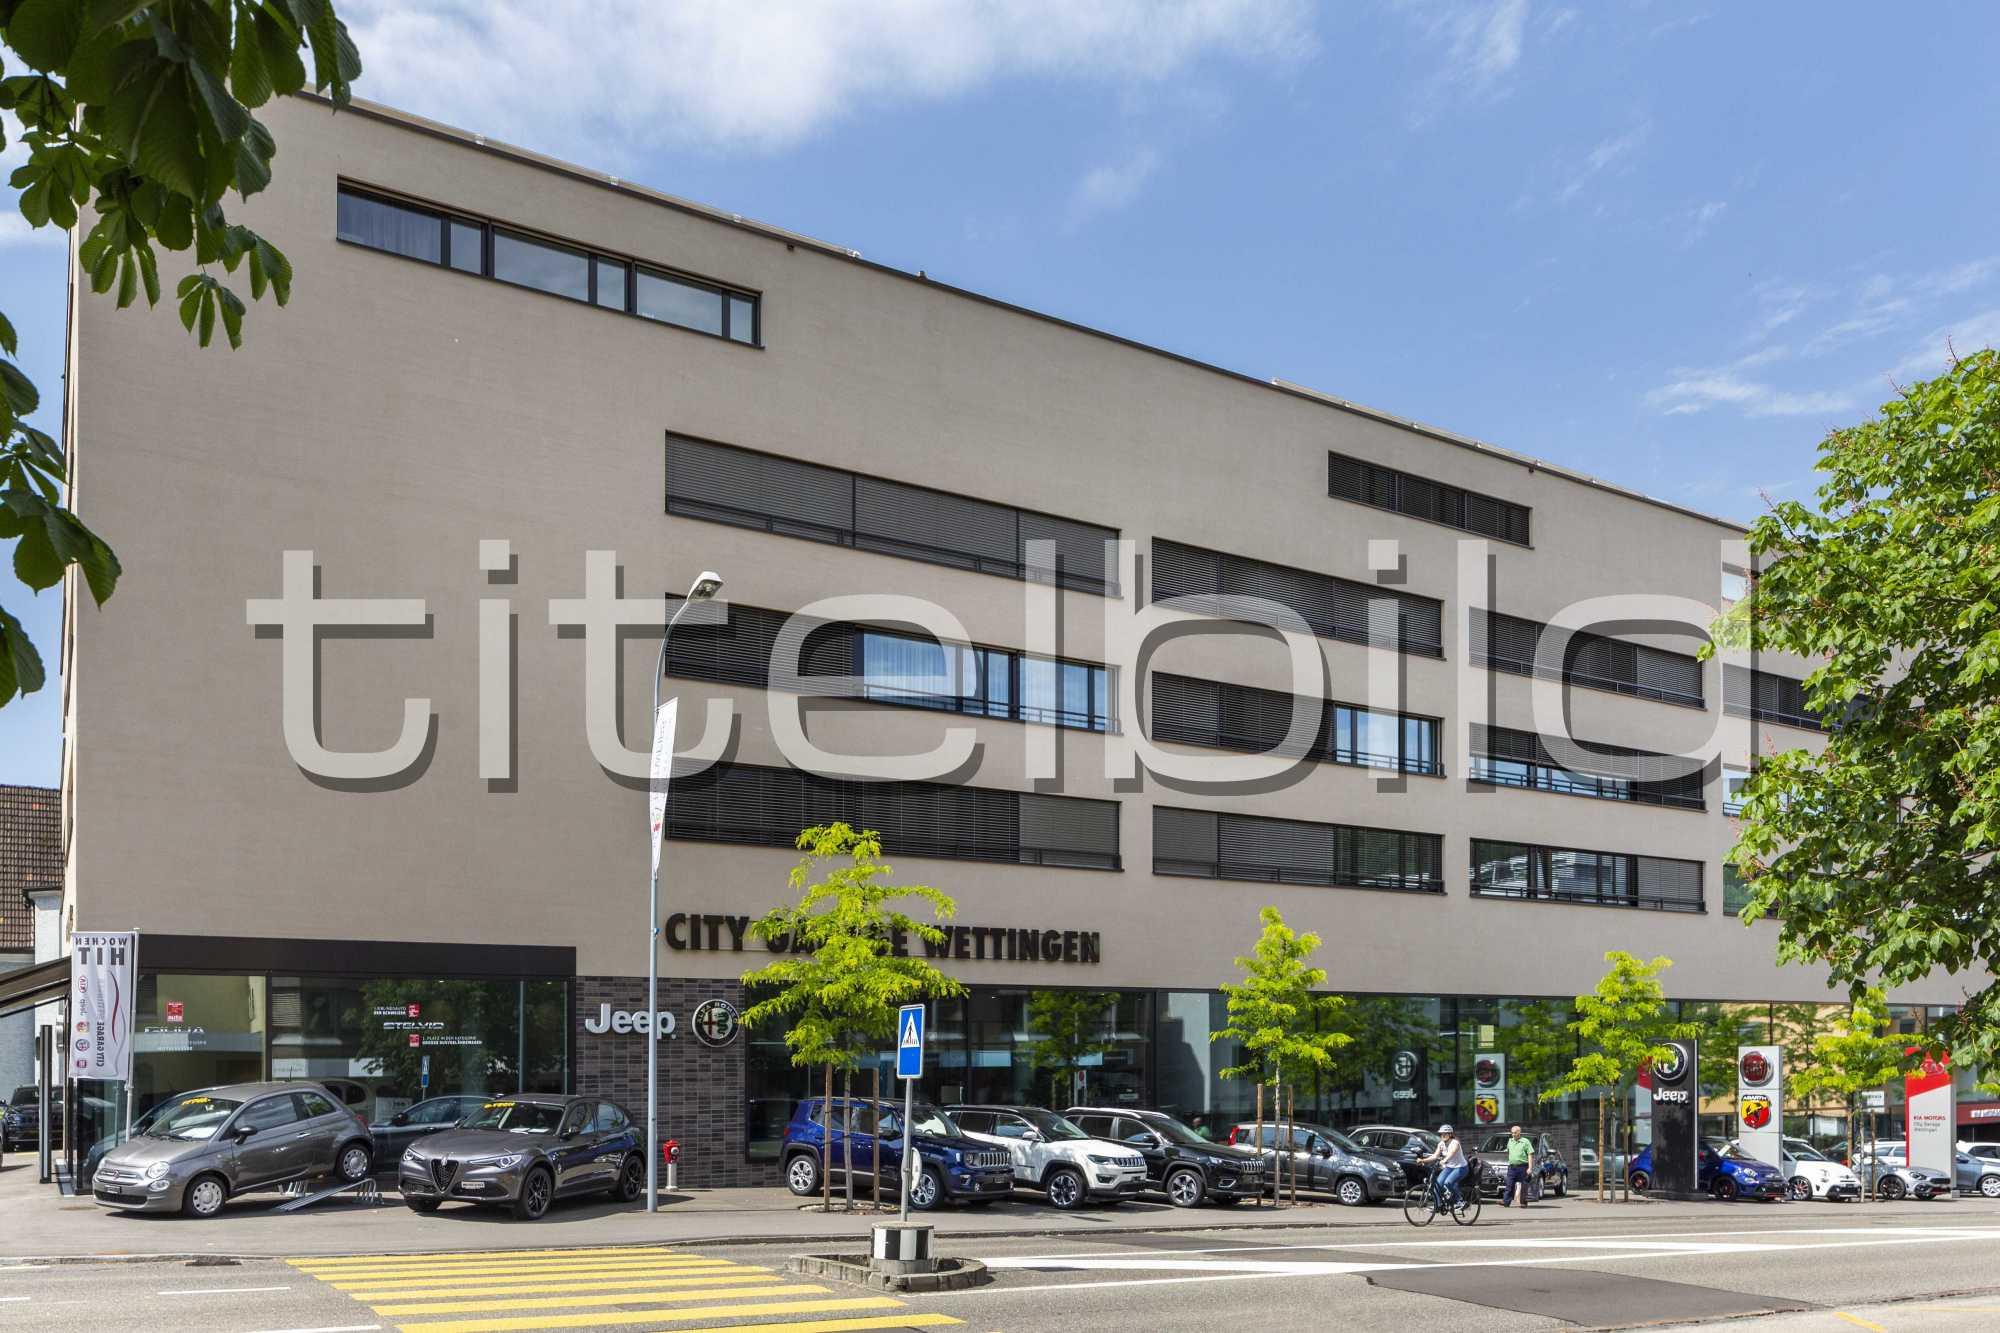 Projektbild-Nr. 2: City Garage Wettingen